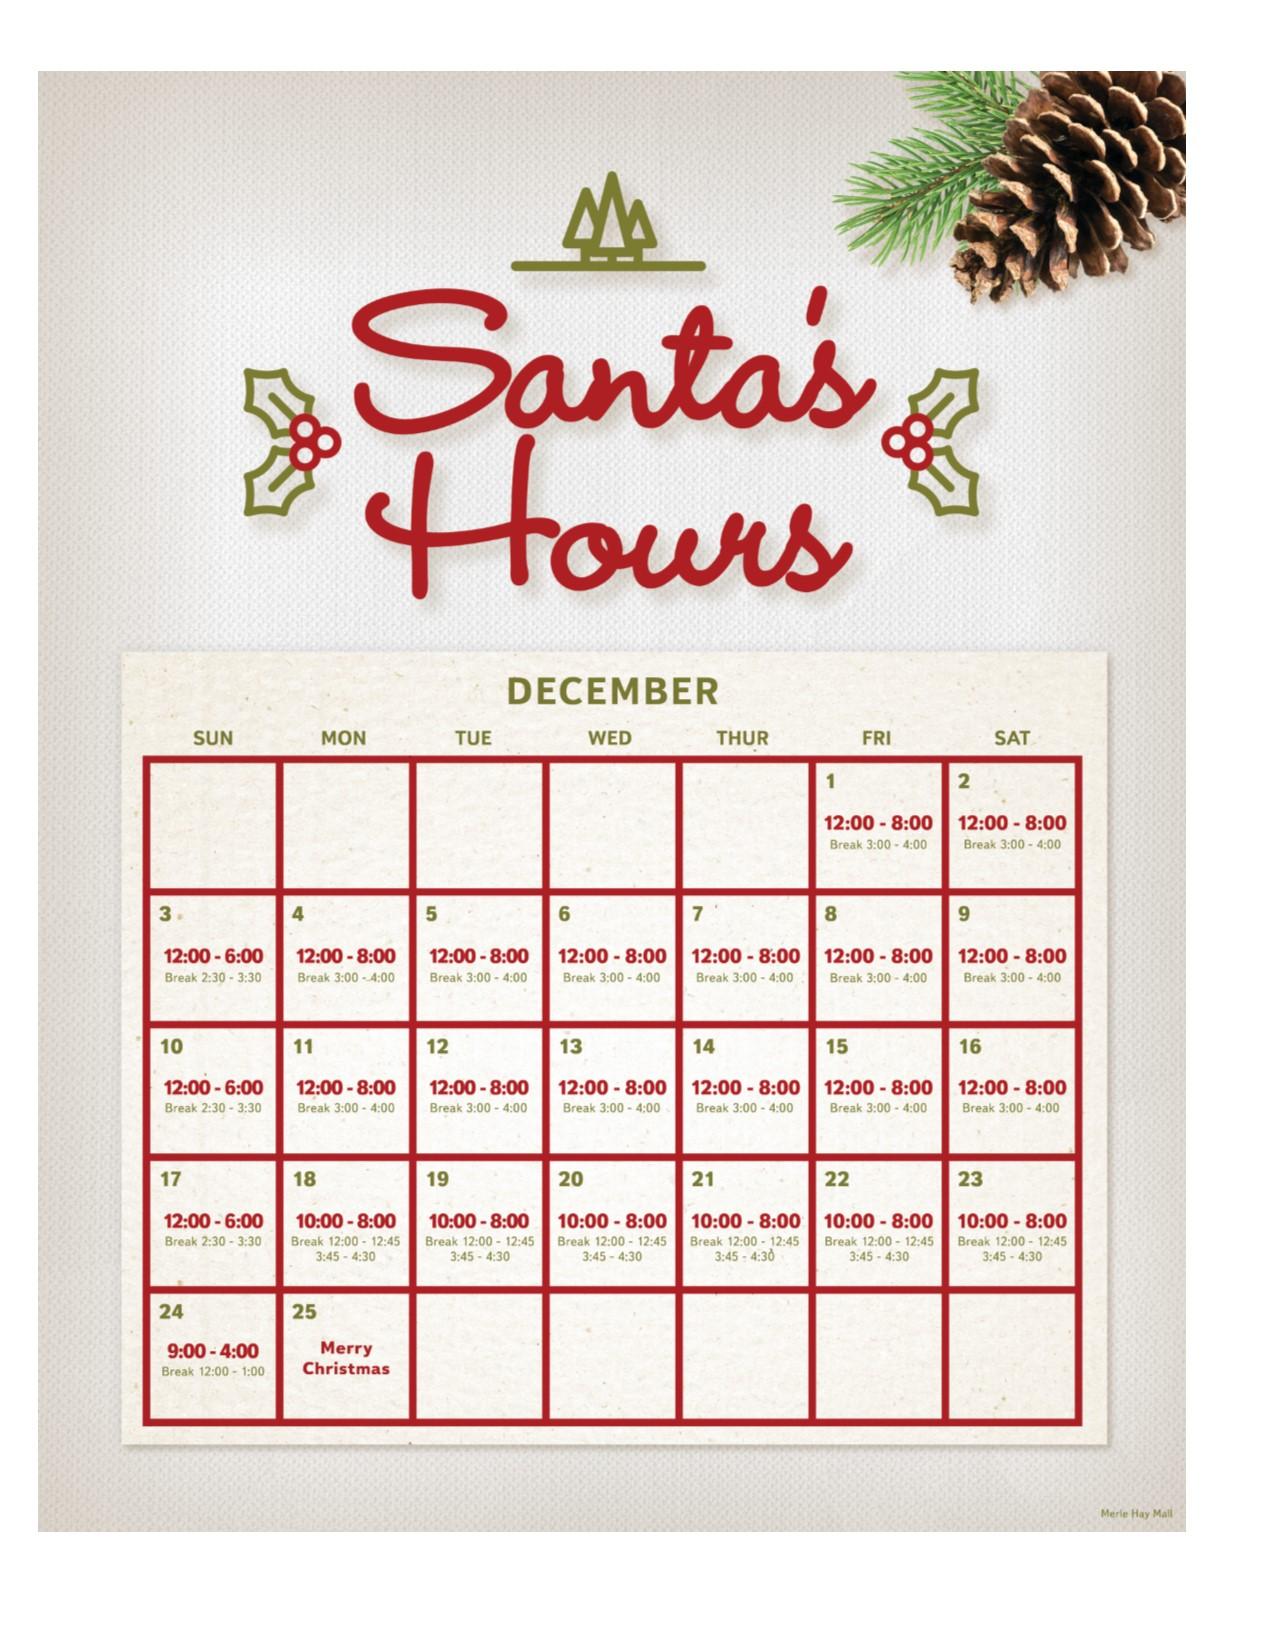 2017 Santa Photo DECEMBER Hours